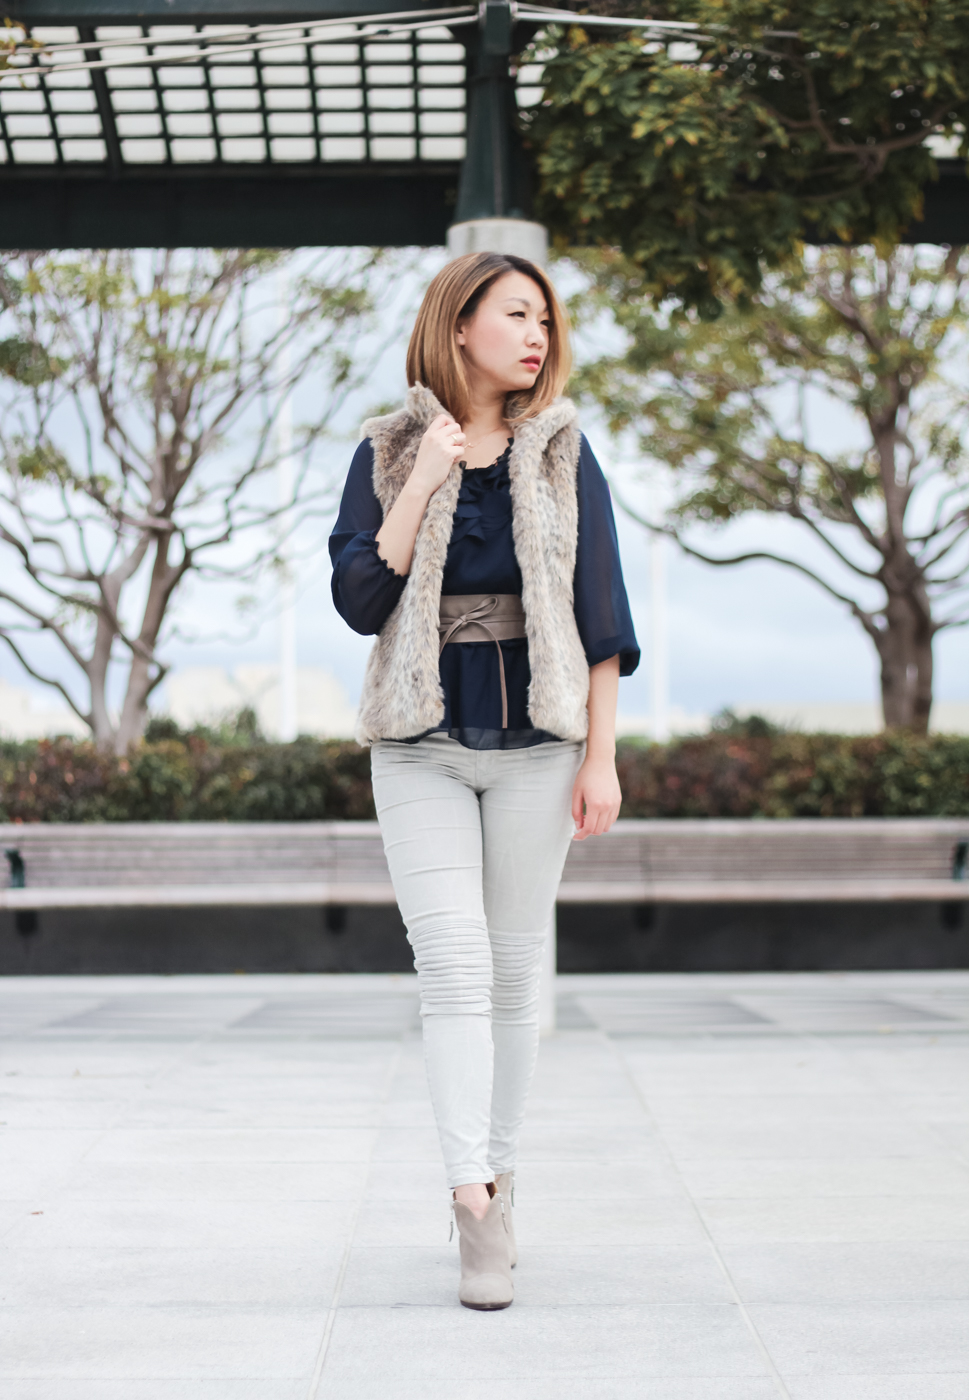 San Francisco Winter | Faux Fur Vest & Rag & Bone Margot Booties | The Chic Diary